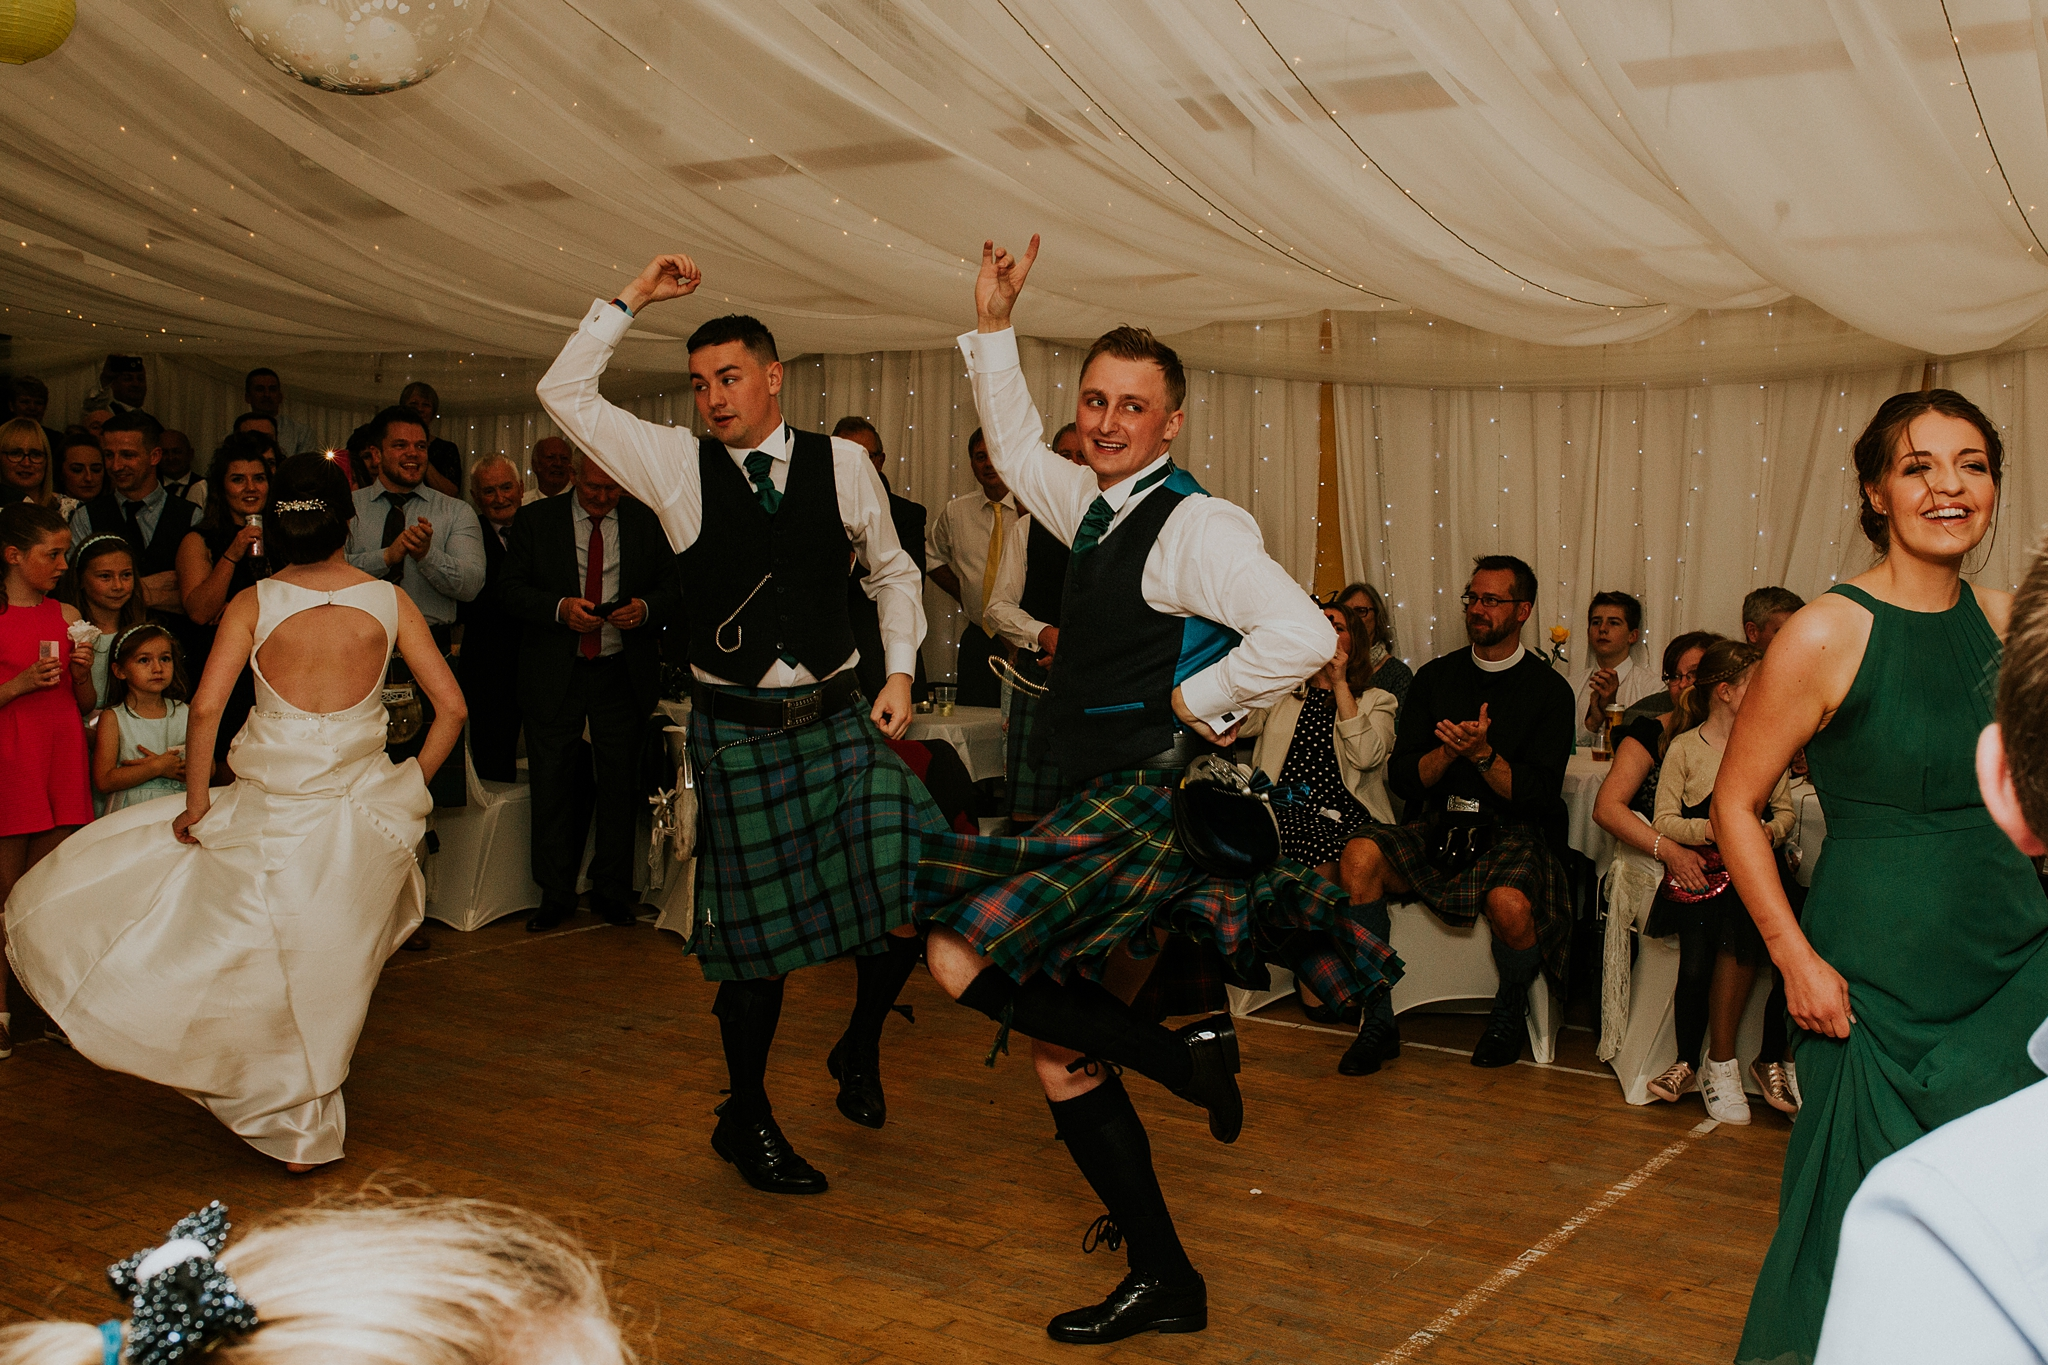 Linda&Shockie_northuist_wedding_photographer-56.JPG